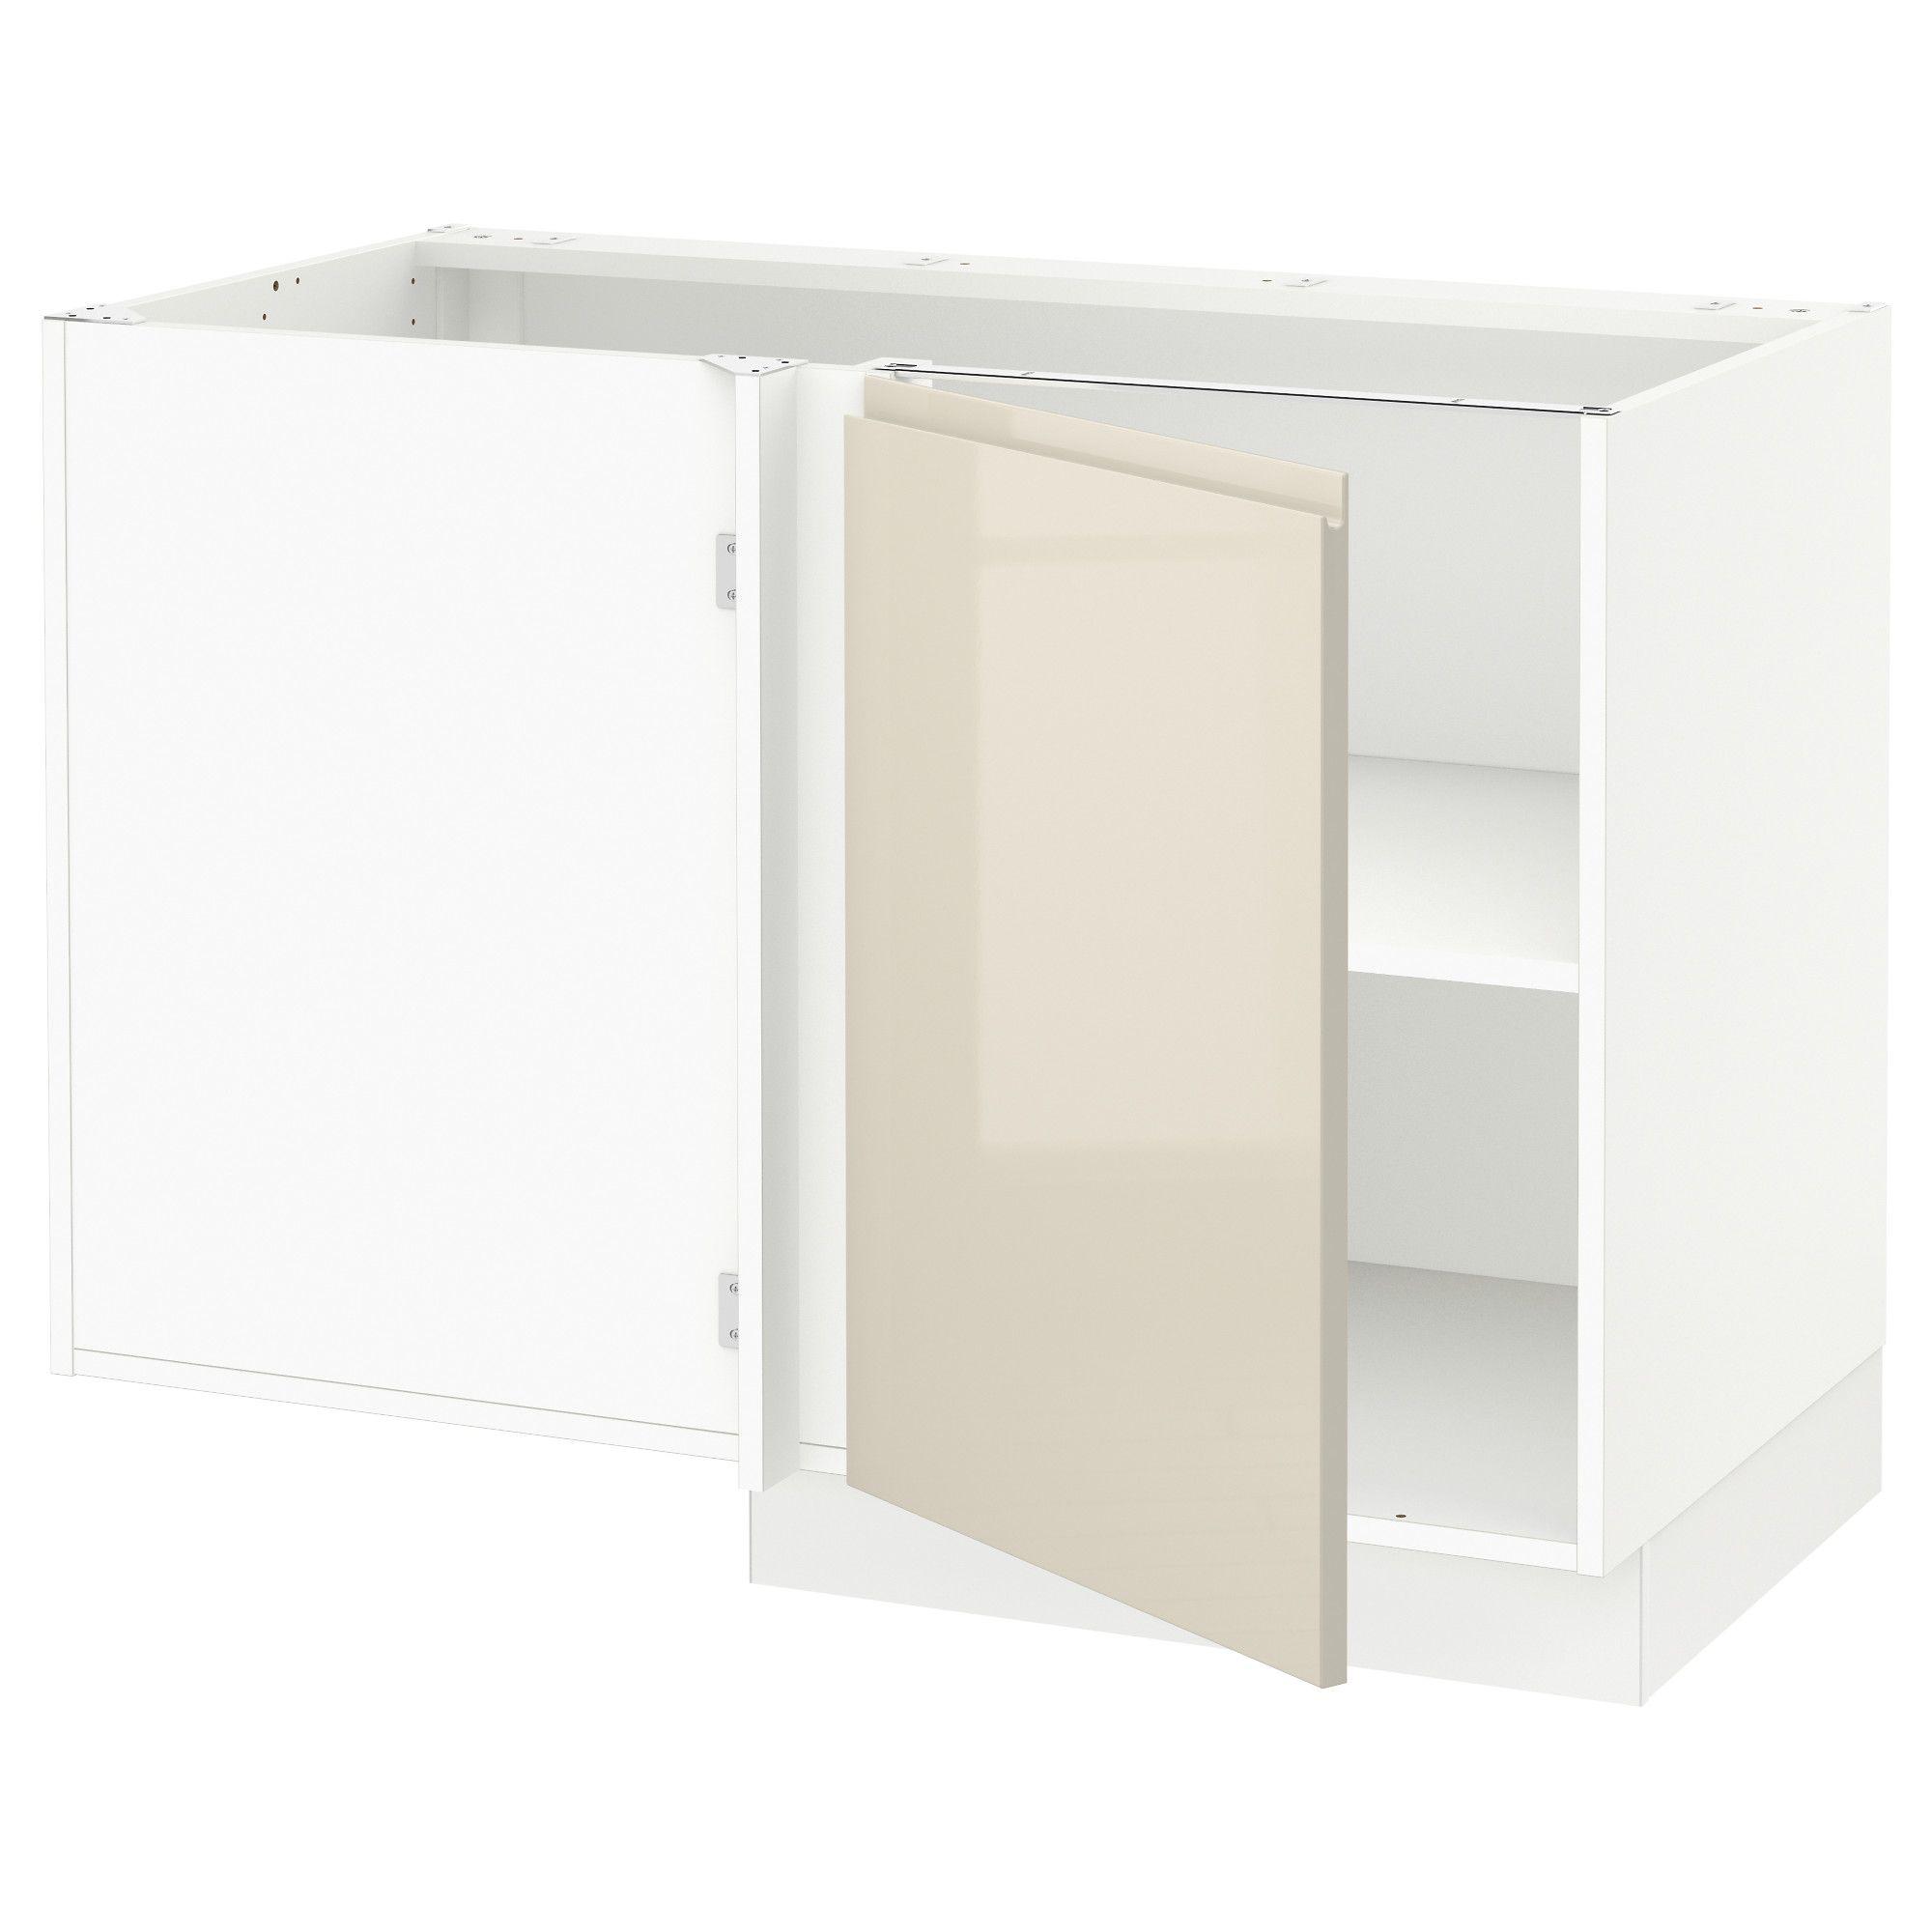 ikea sektion white corner base cabinet with shelf frame colour in rh pinterest com